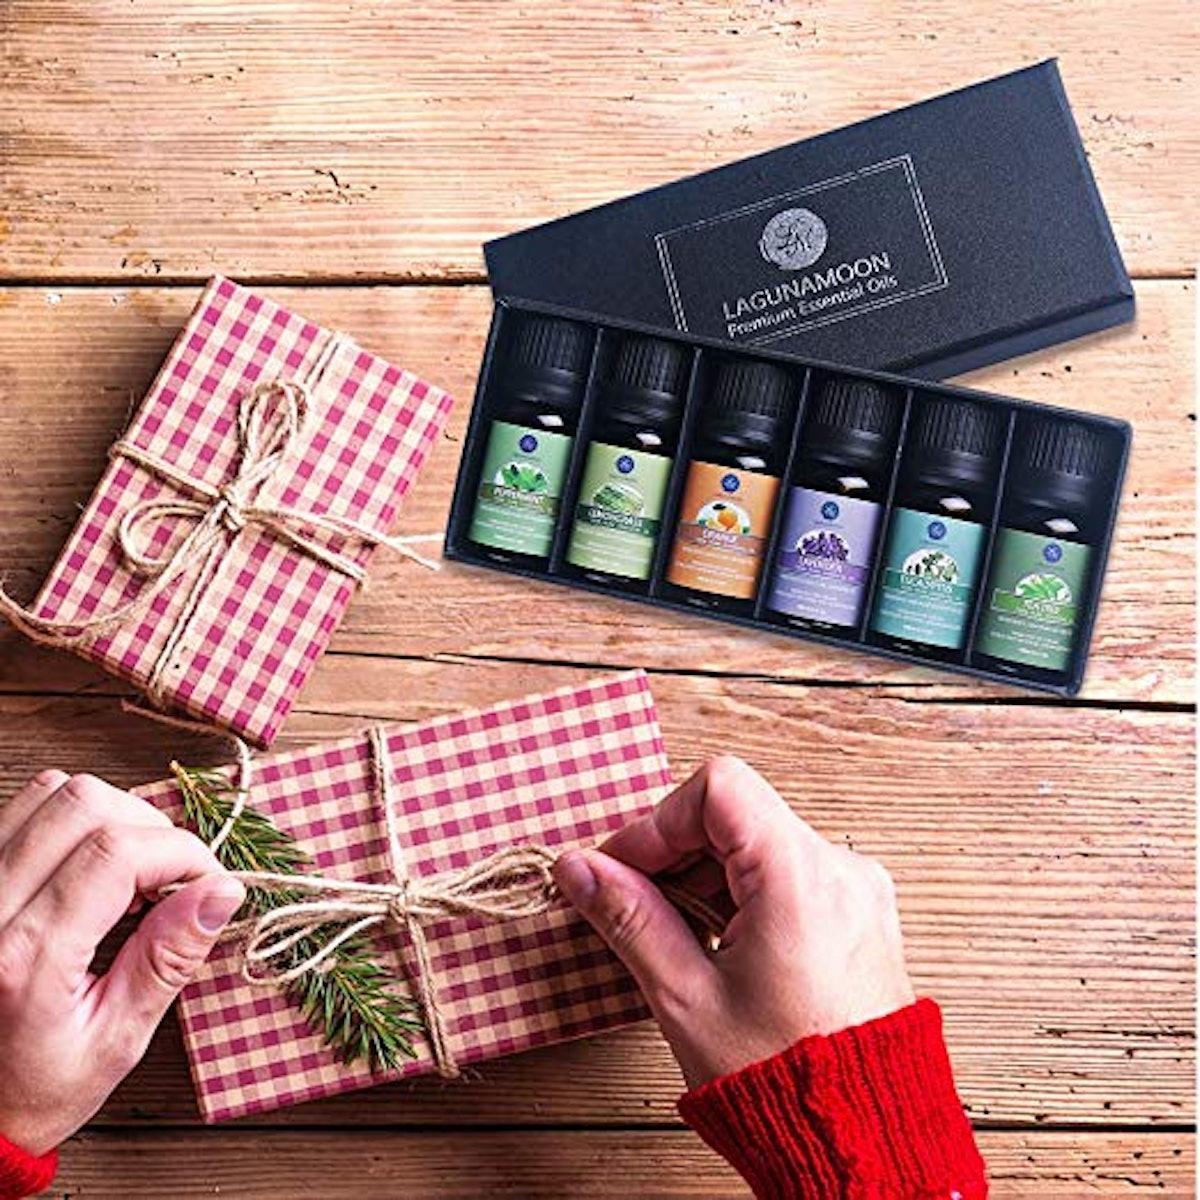 Lagunamoon Essential Oils Gift Set (6-Piece Set)